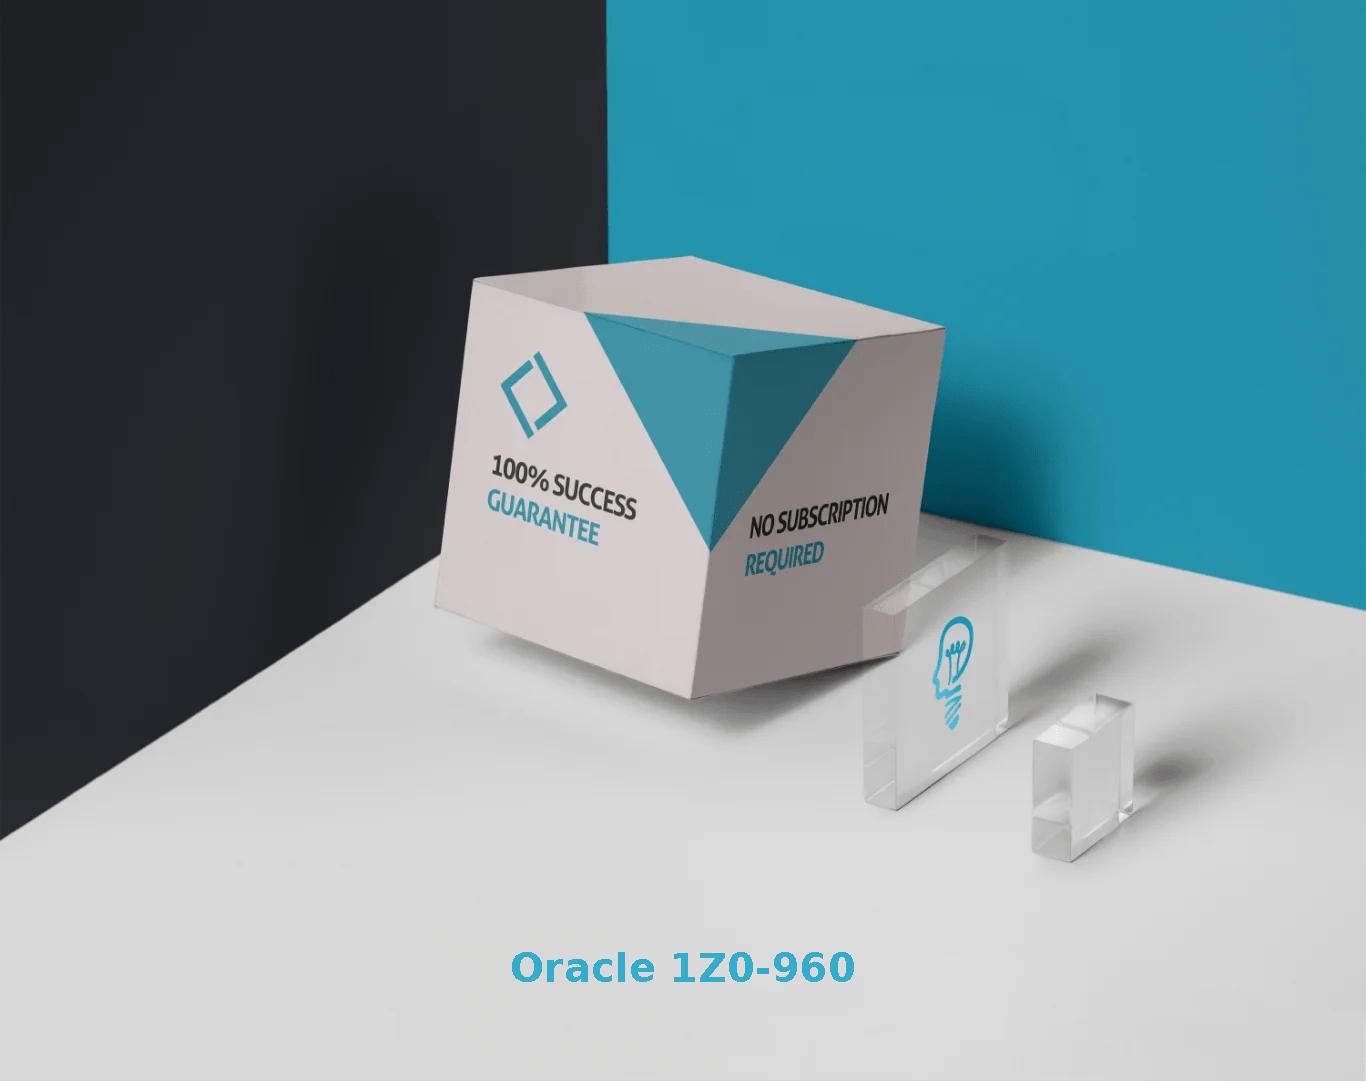 Oracle 1Z0-960 Exams